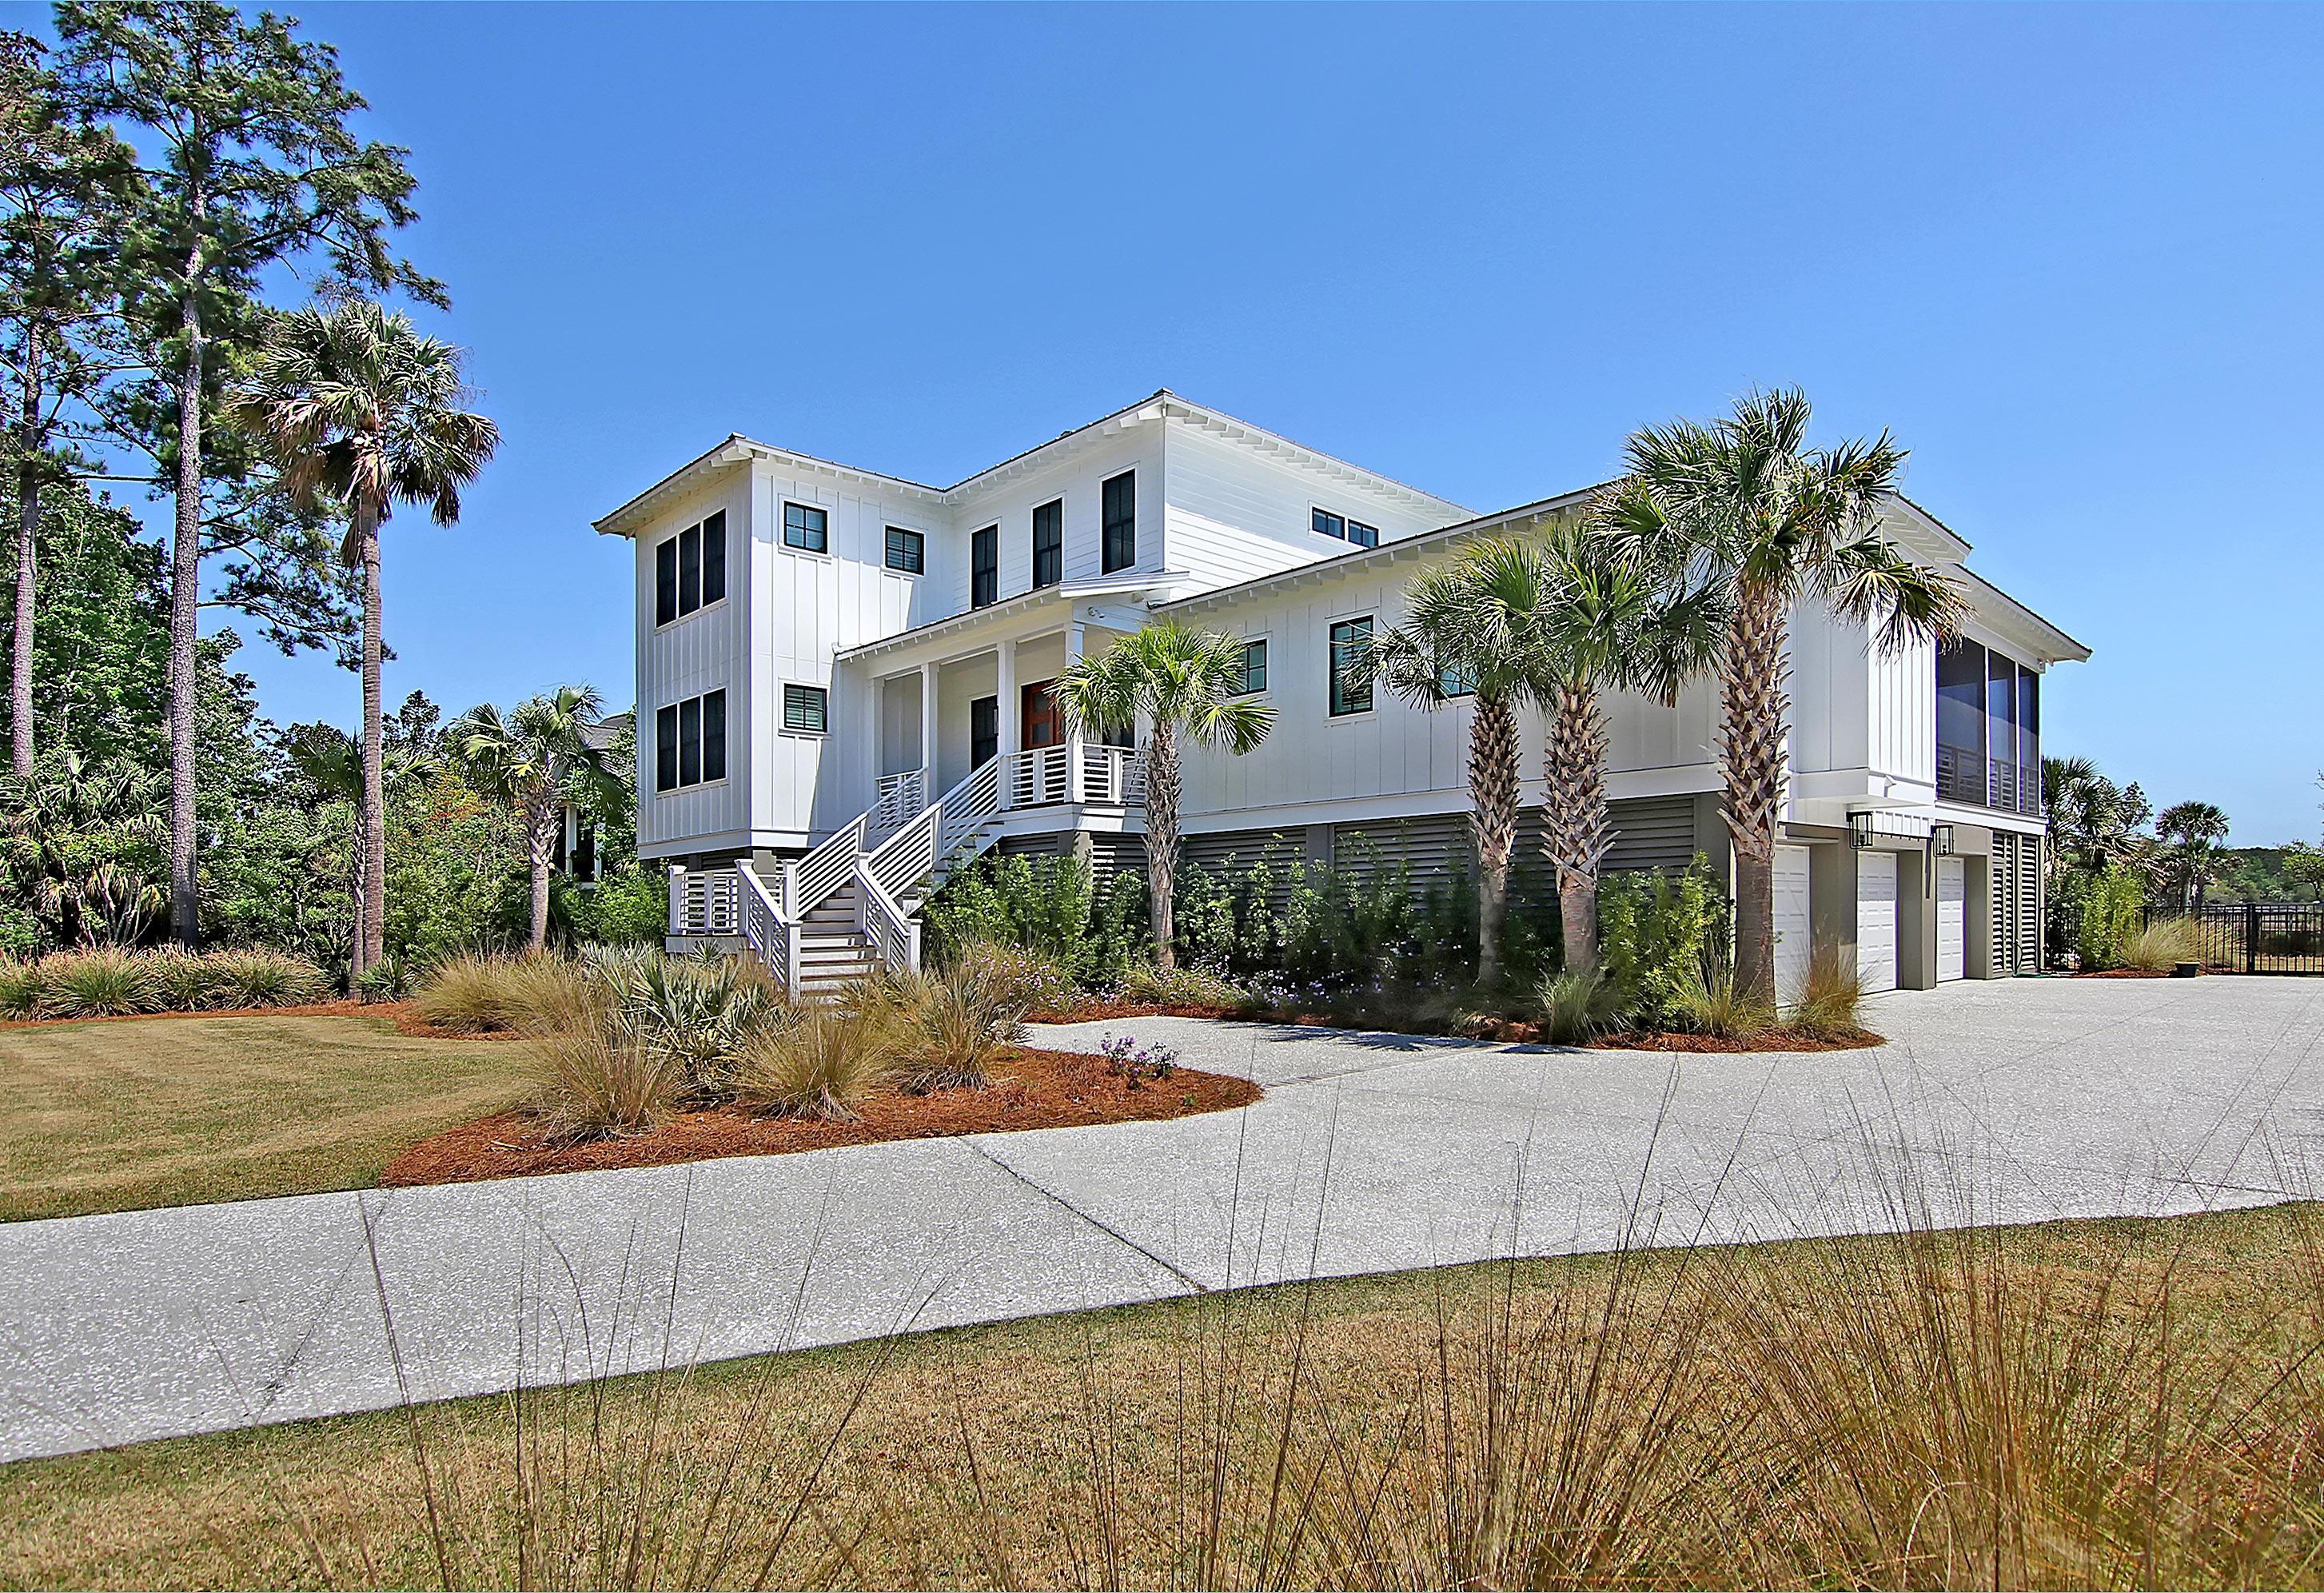 Dunes West Homes For Sale - 2456 Darts Cove, Mount Pleasant, SC - 66